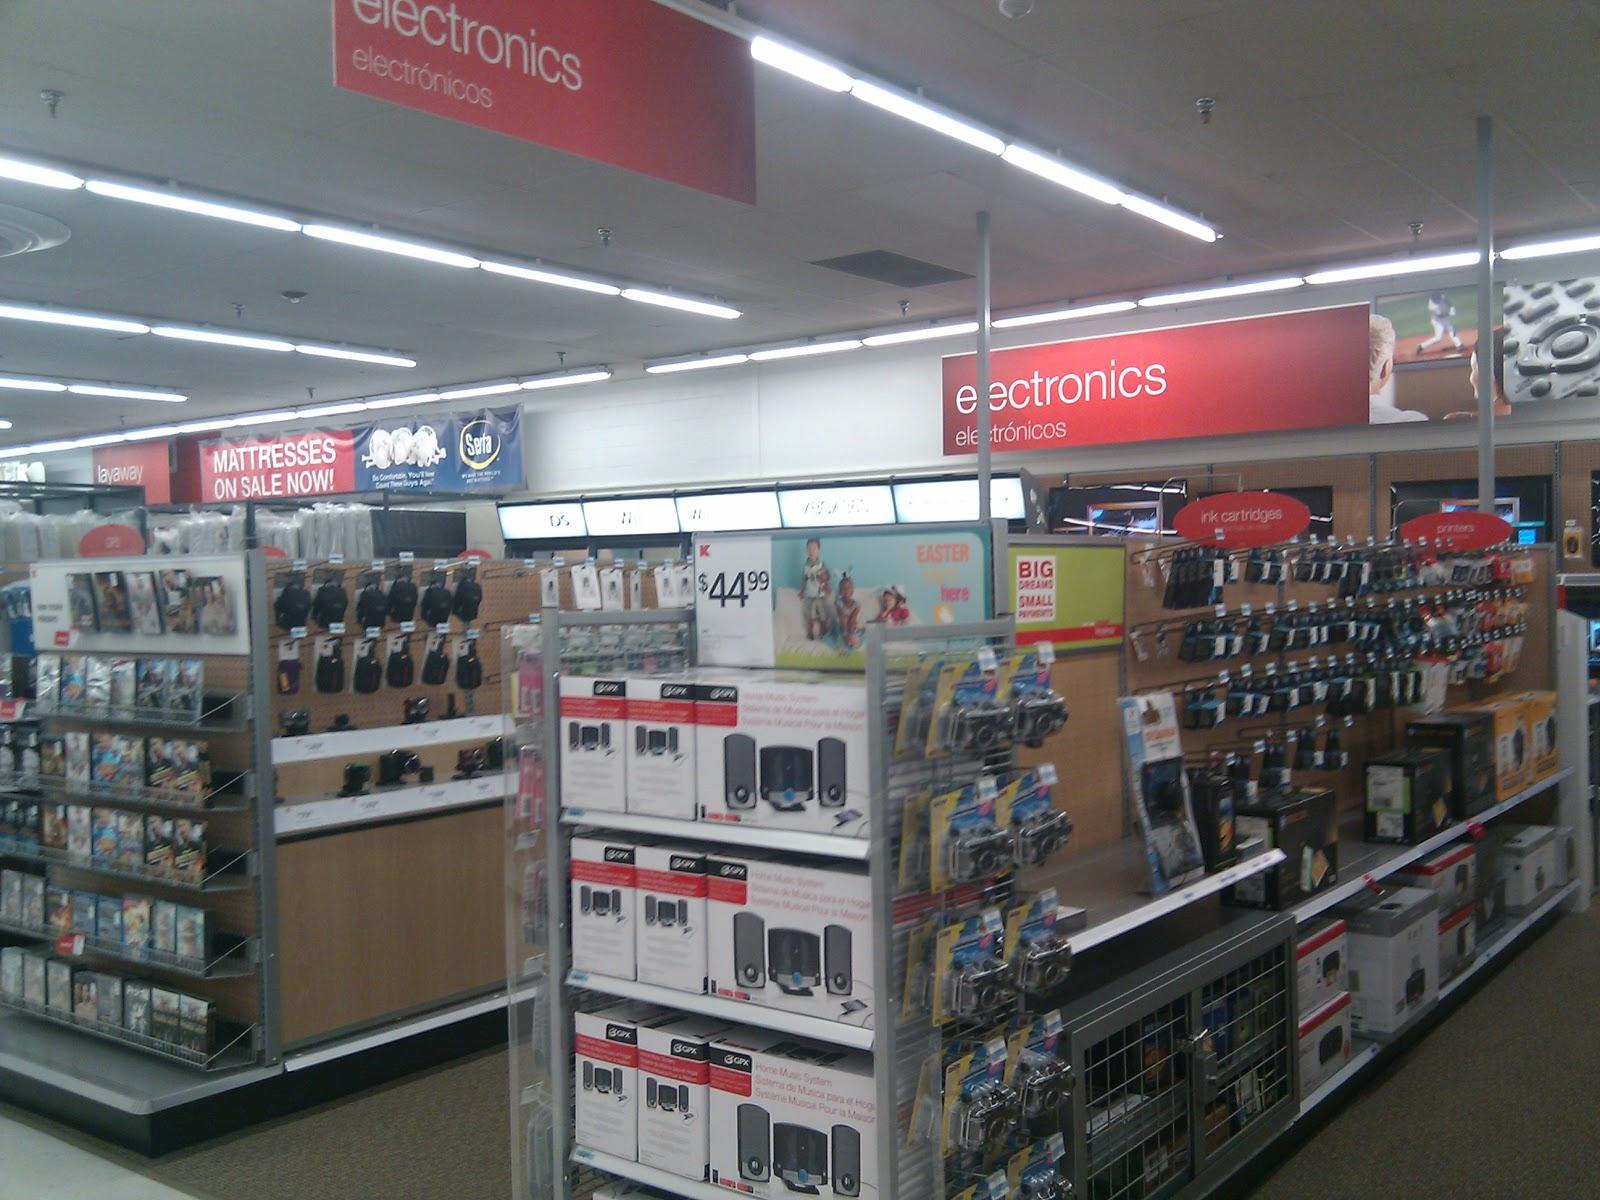 Sears electronics department.